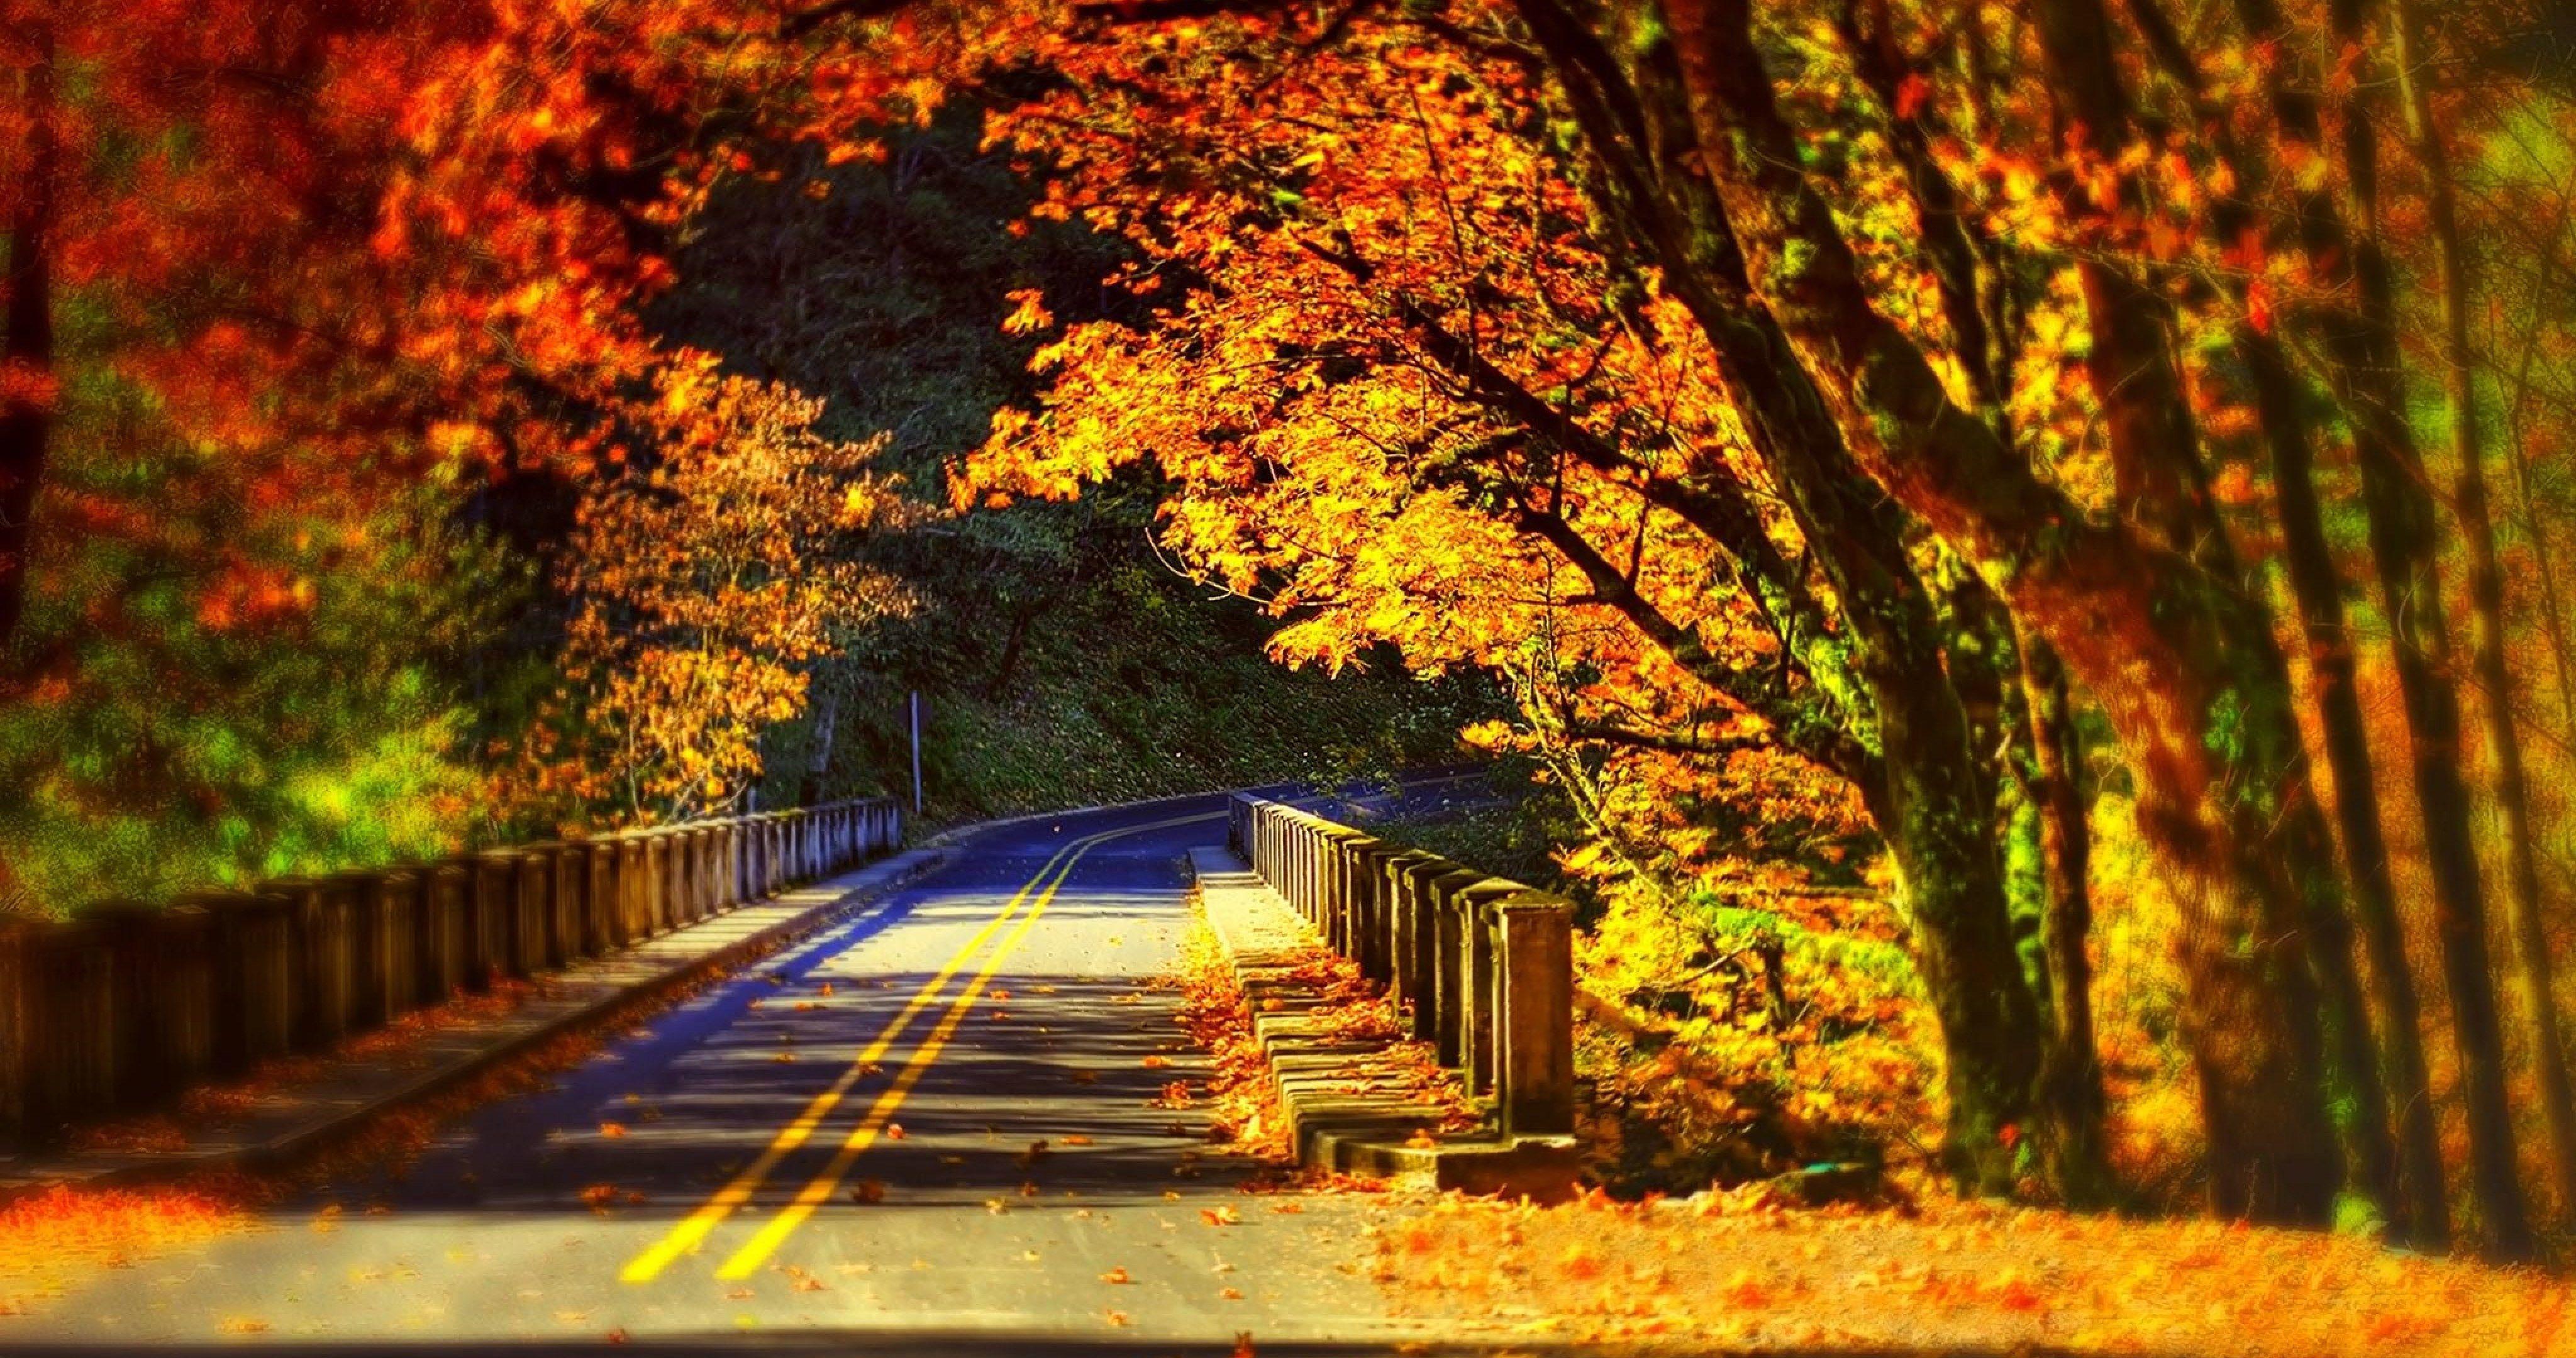 Road Bridge In Colorfull Nature 4k Ultra Hd Wallpaper Autumn Scenery Scenery Wallpaper Scenic Autumn